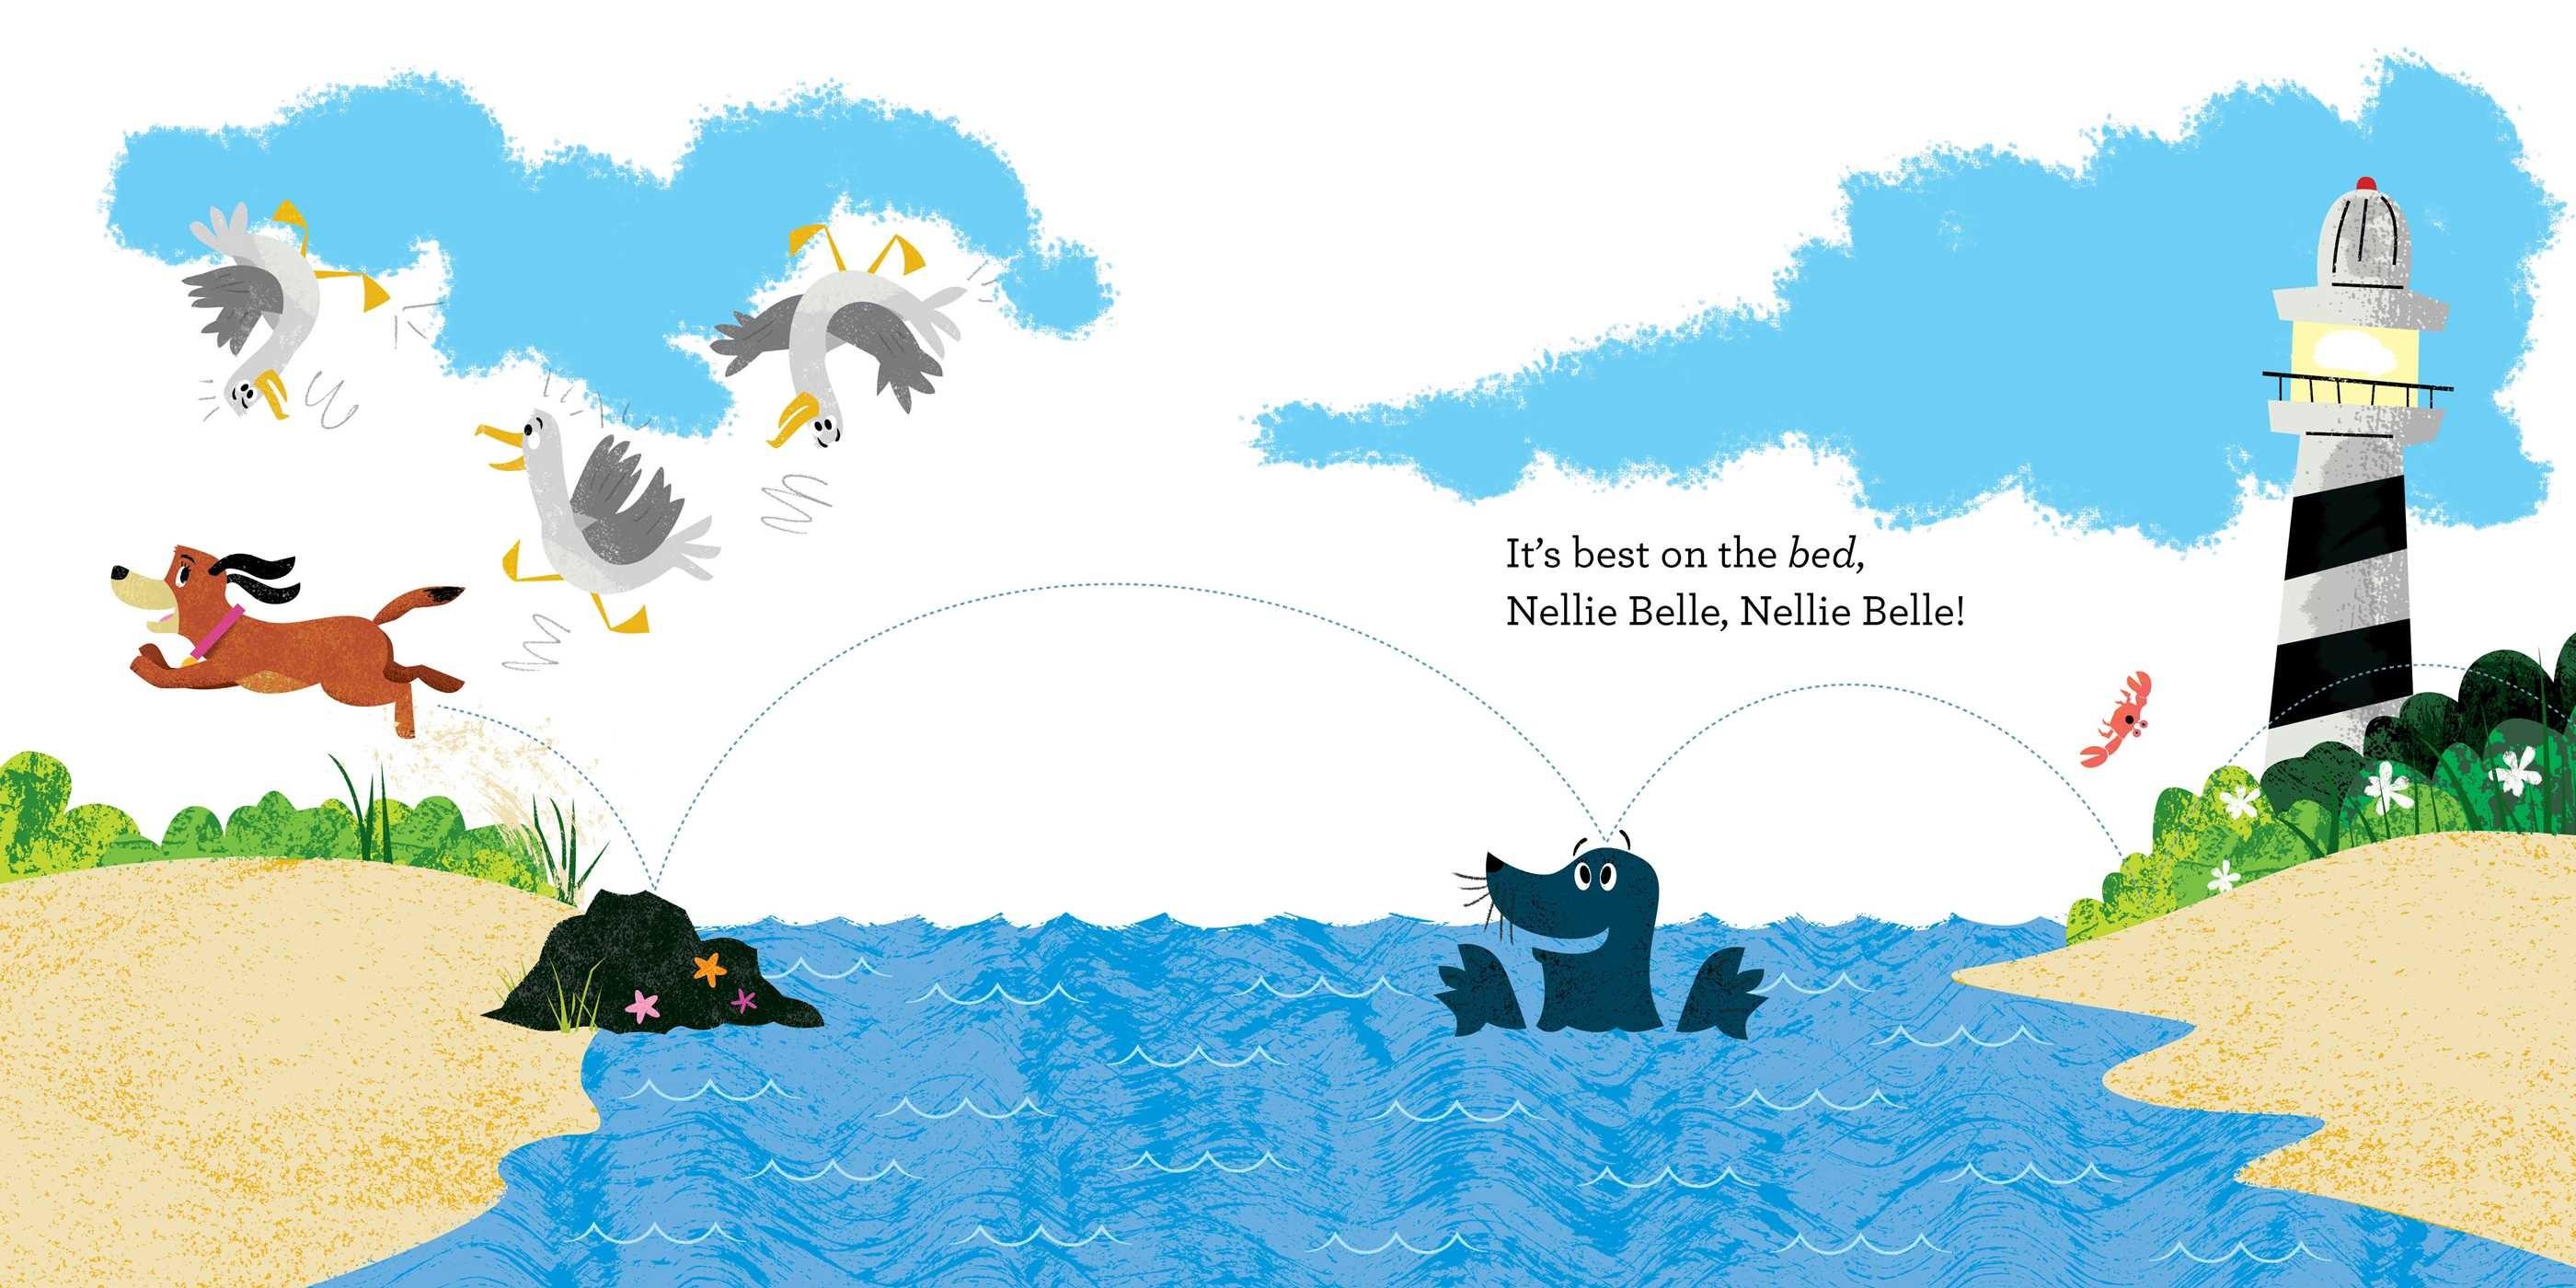 Nellie belle 9781416990055.in05